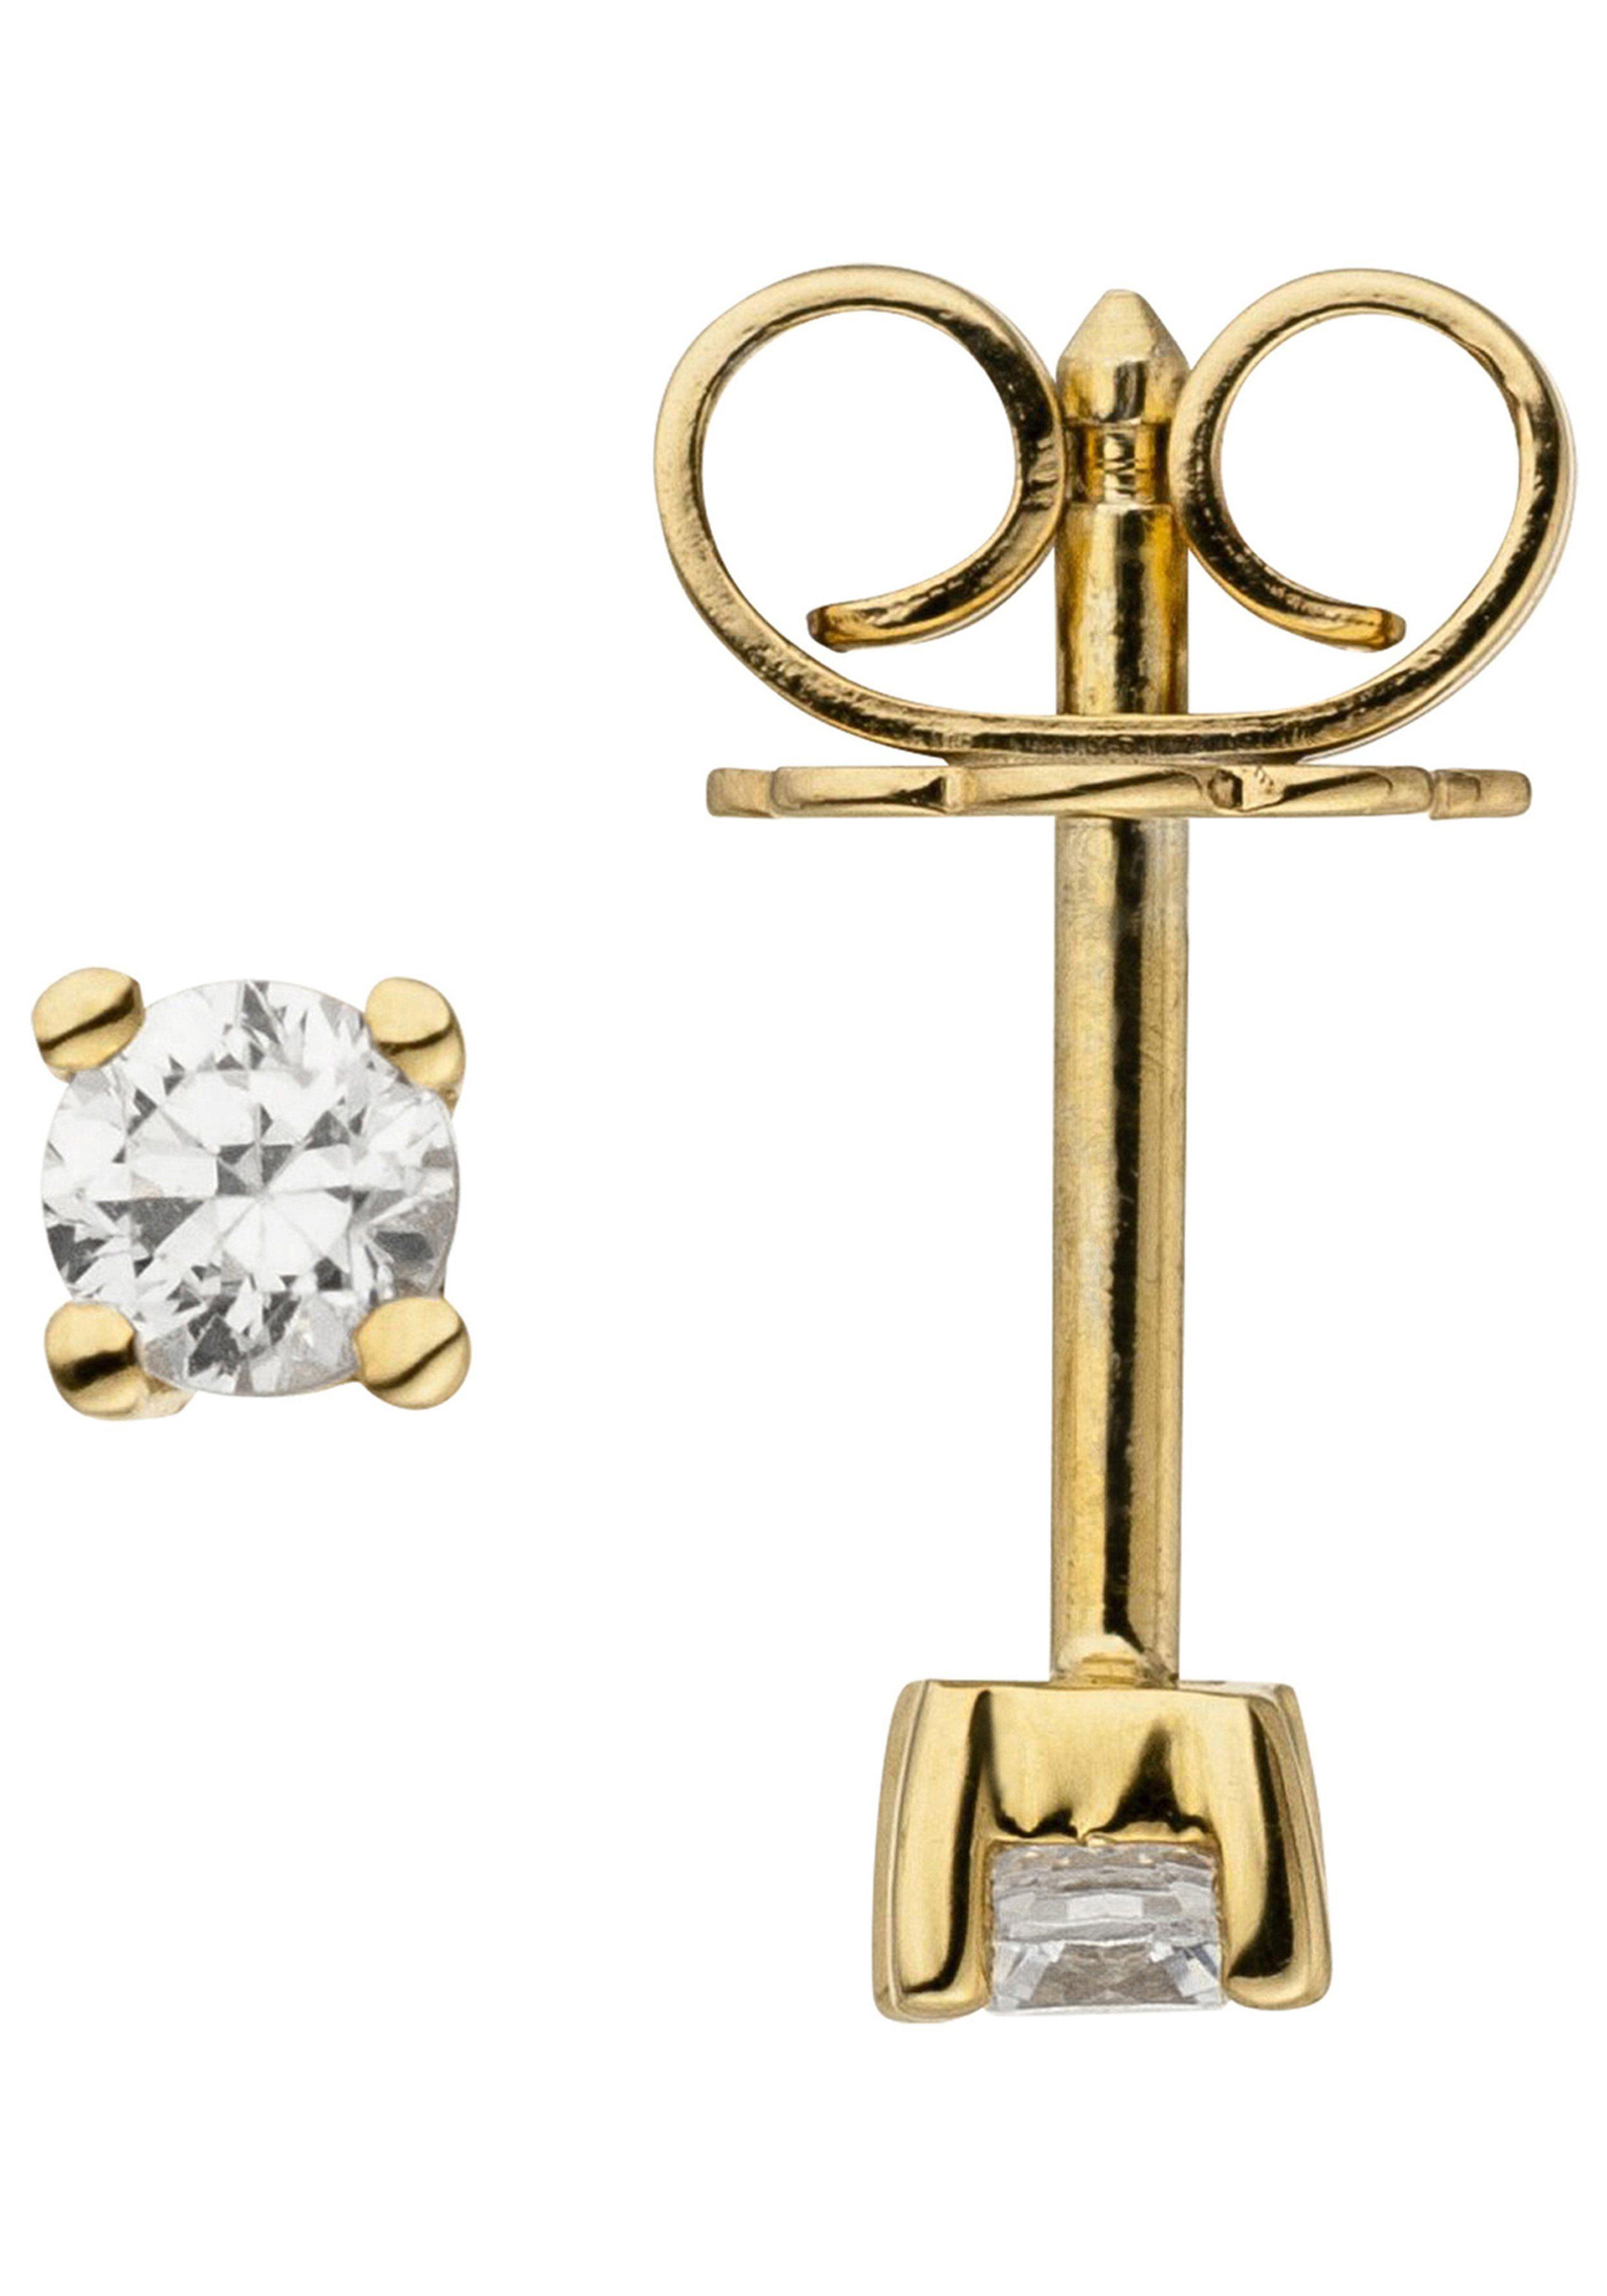 JOBO Paar Ohrstecker »Solitär« 585 Gold mit 2 Diamanten Brillanten 0,14 ct.